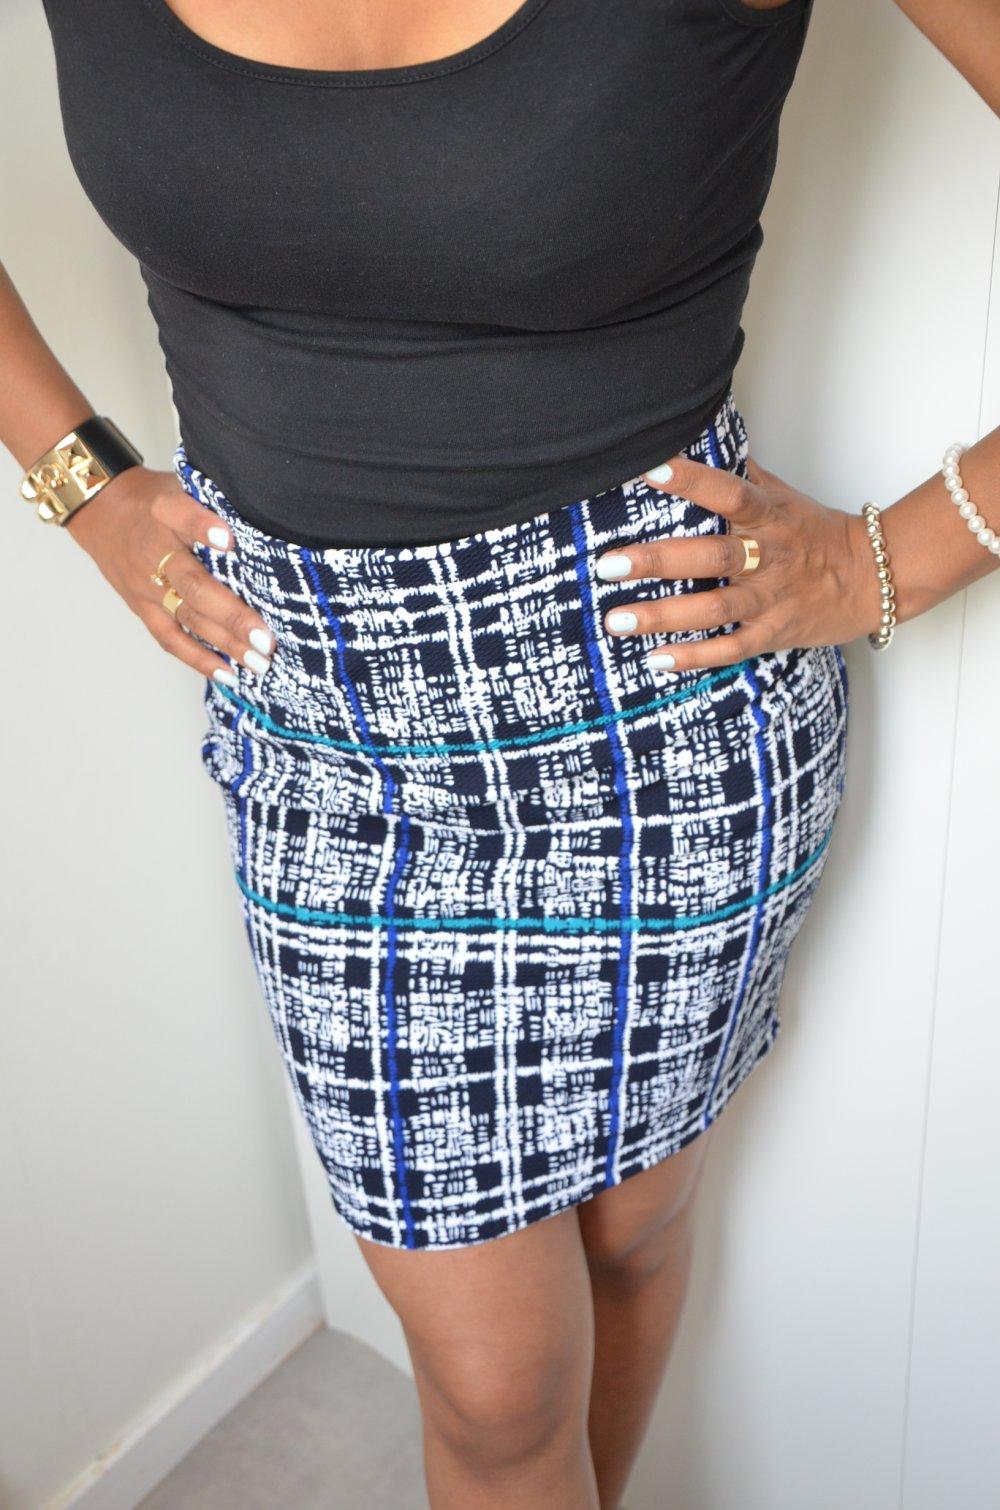 Jupe droite- Crayon motif graphique-Taille haute-High waist skirt